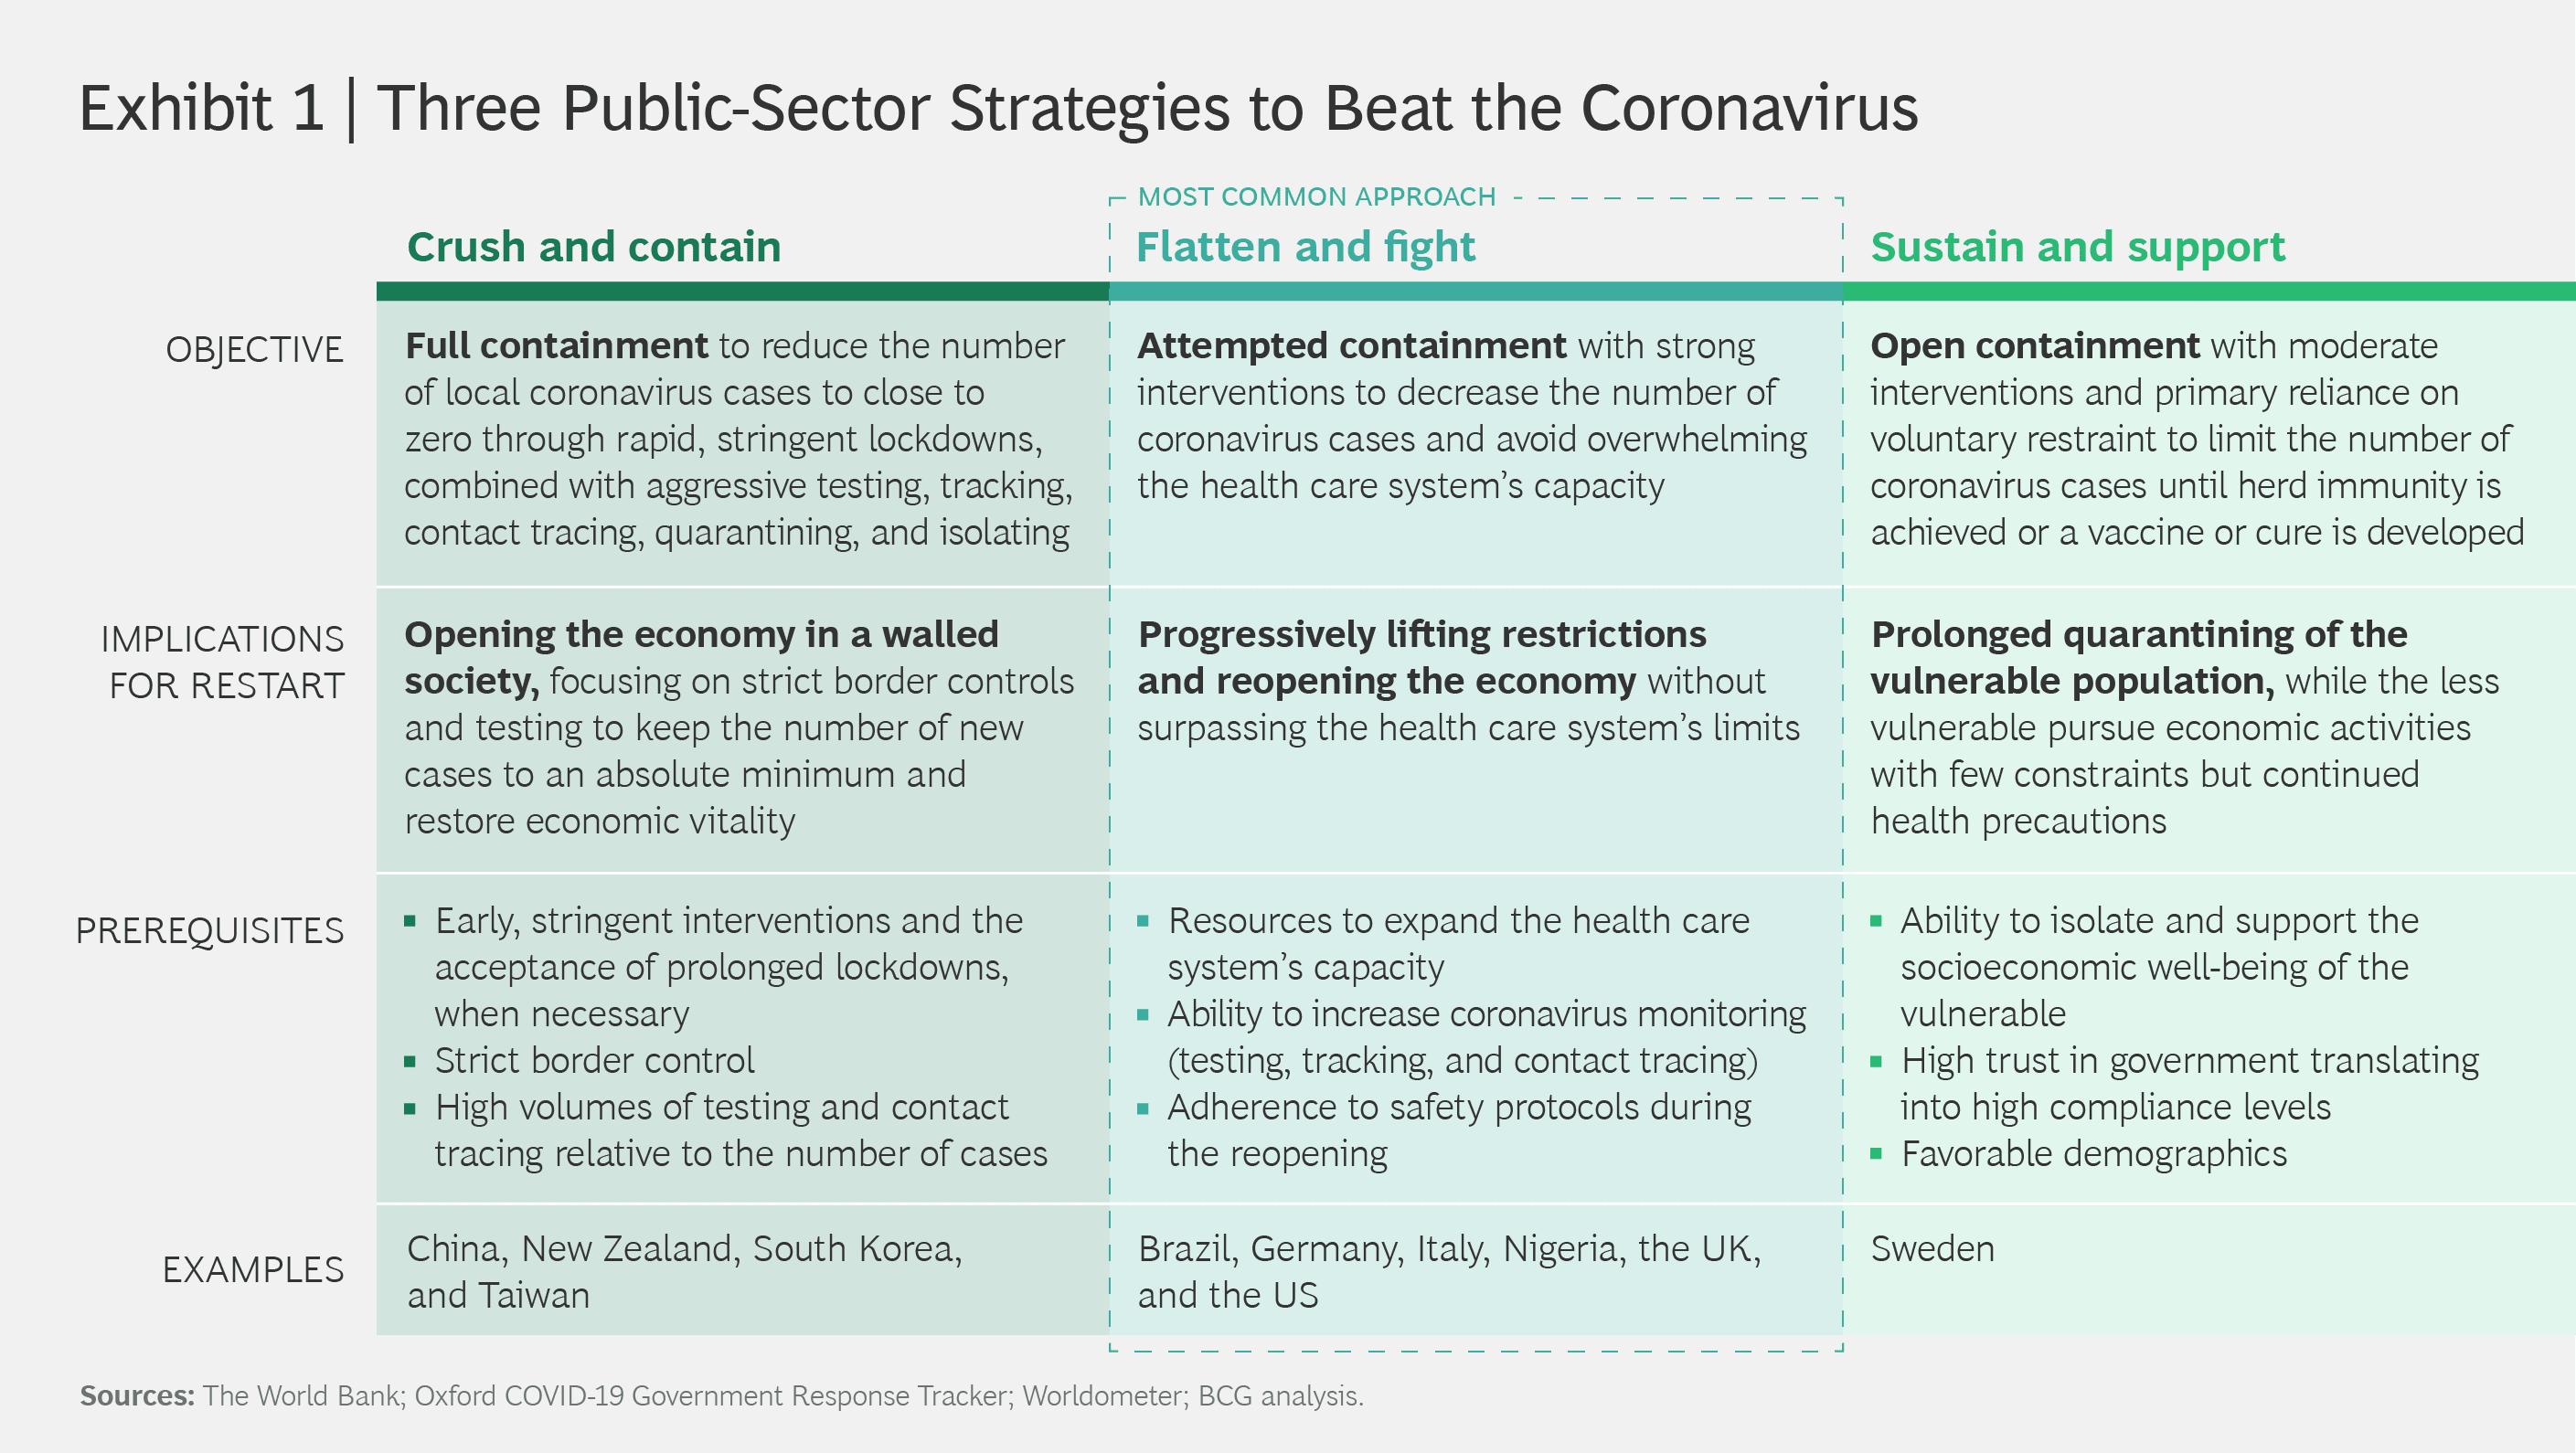 Three Public-Sector Strategies to Beat the Coronavirus